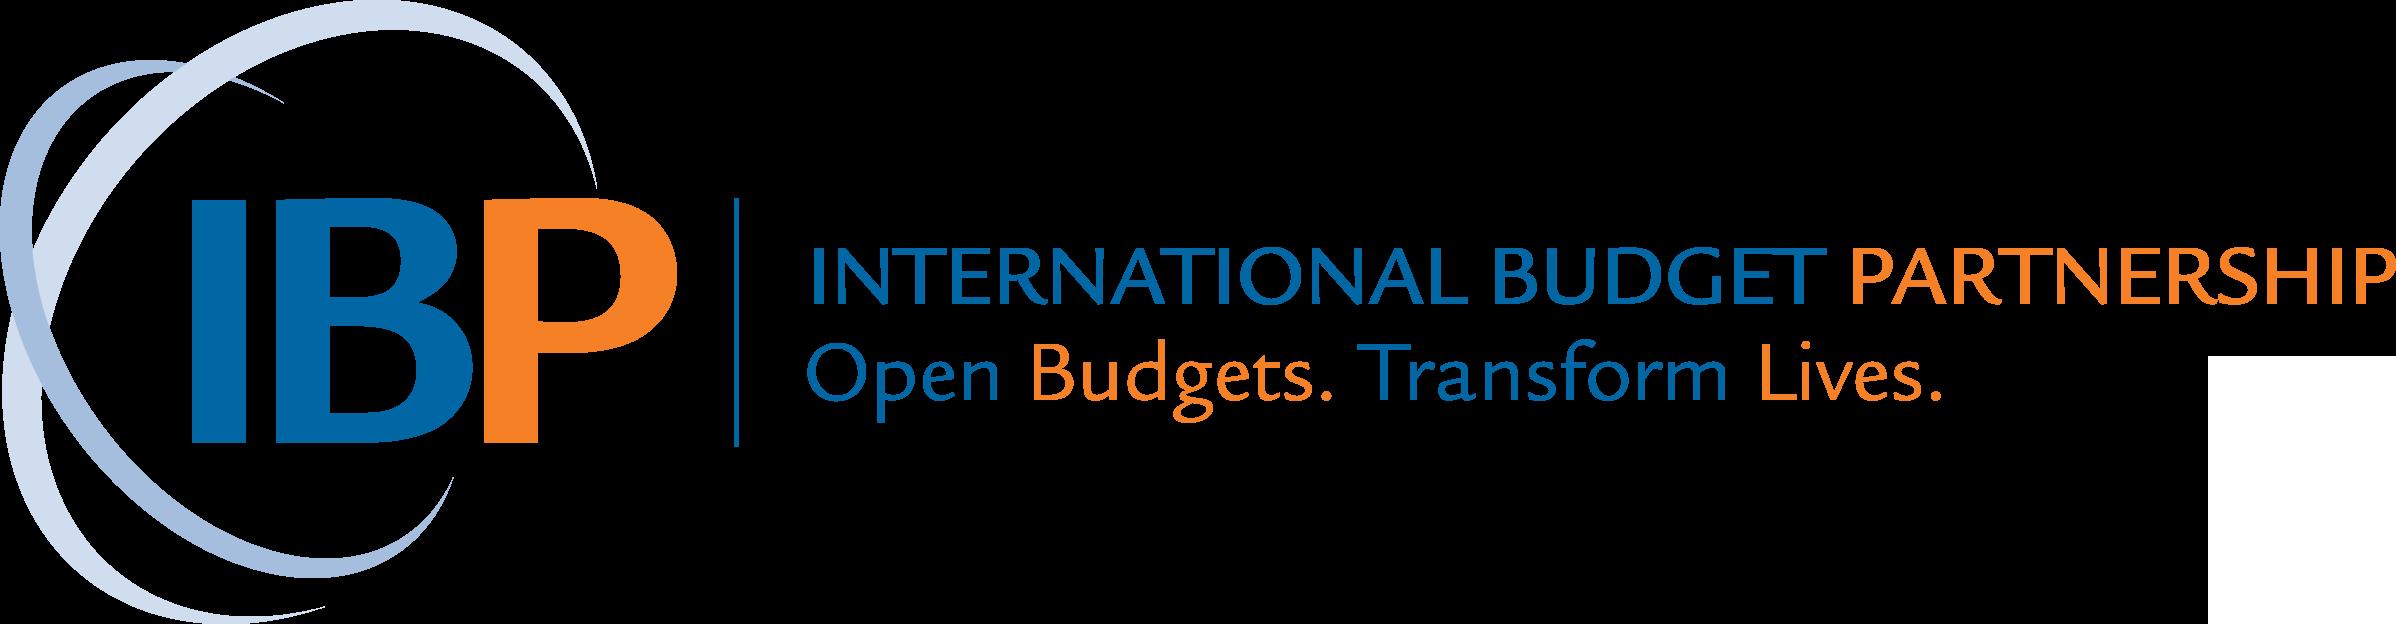 International Budget Partnership logo